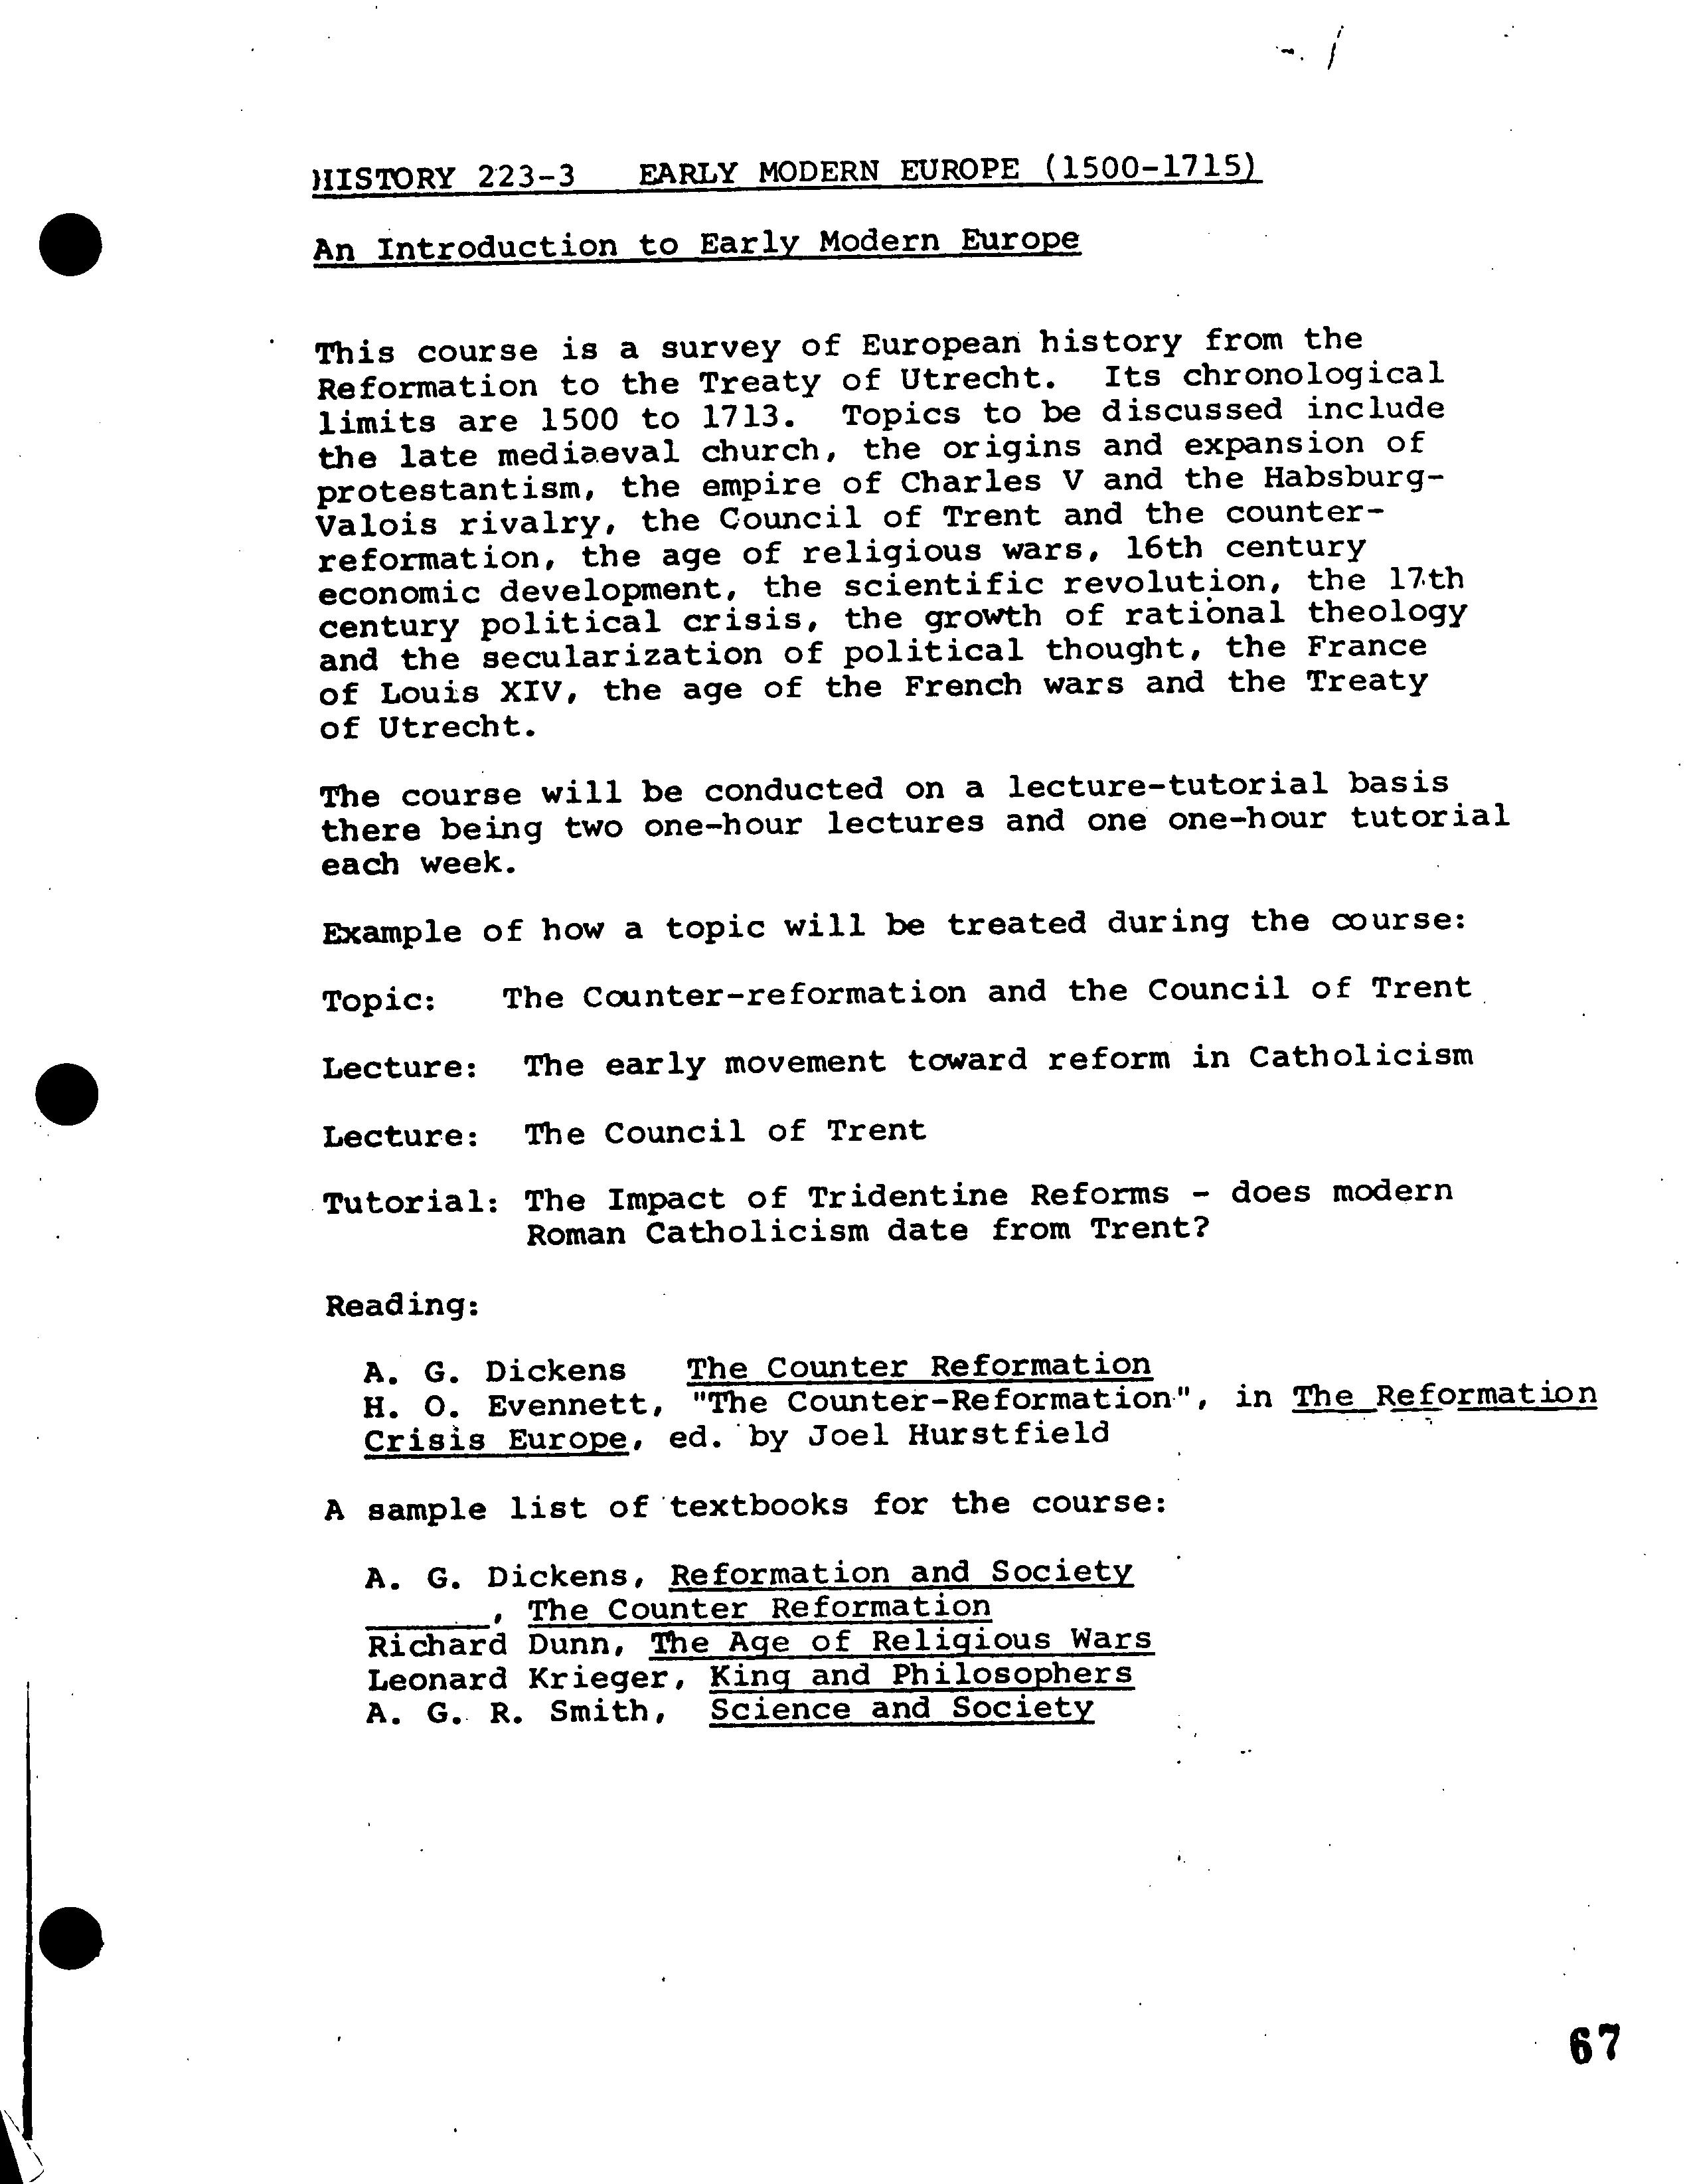 Page 1 Page 2 Page 3 Page 4 Page 5 Page 6 Page 7 Page 8